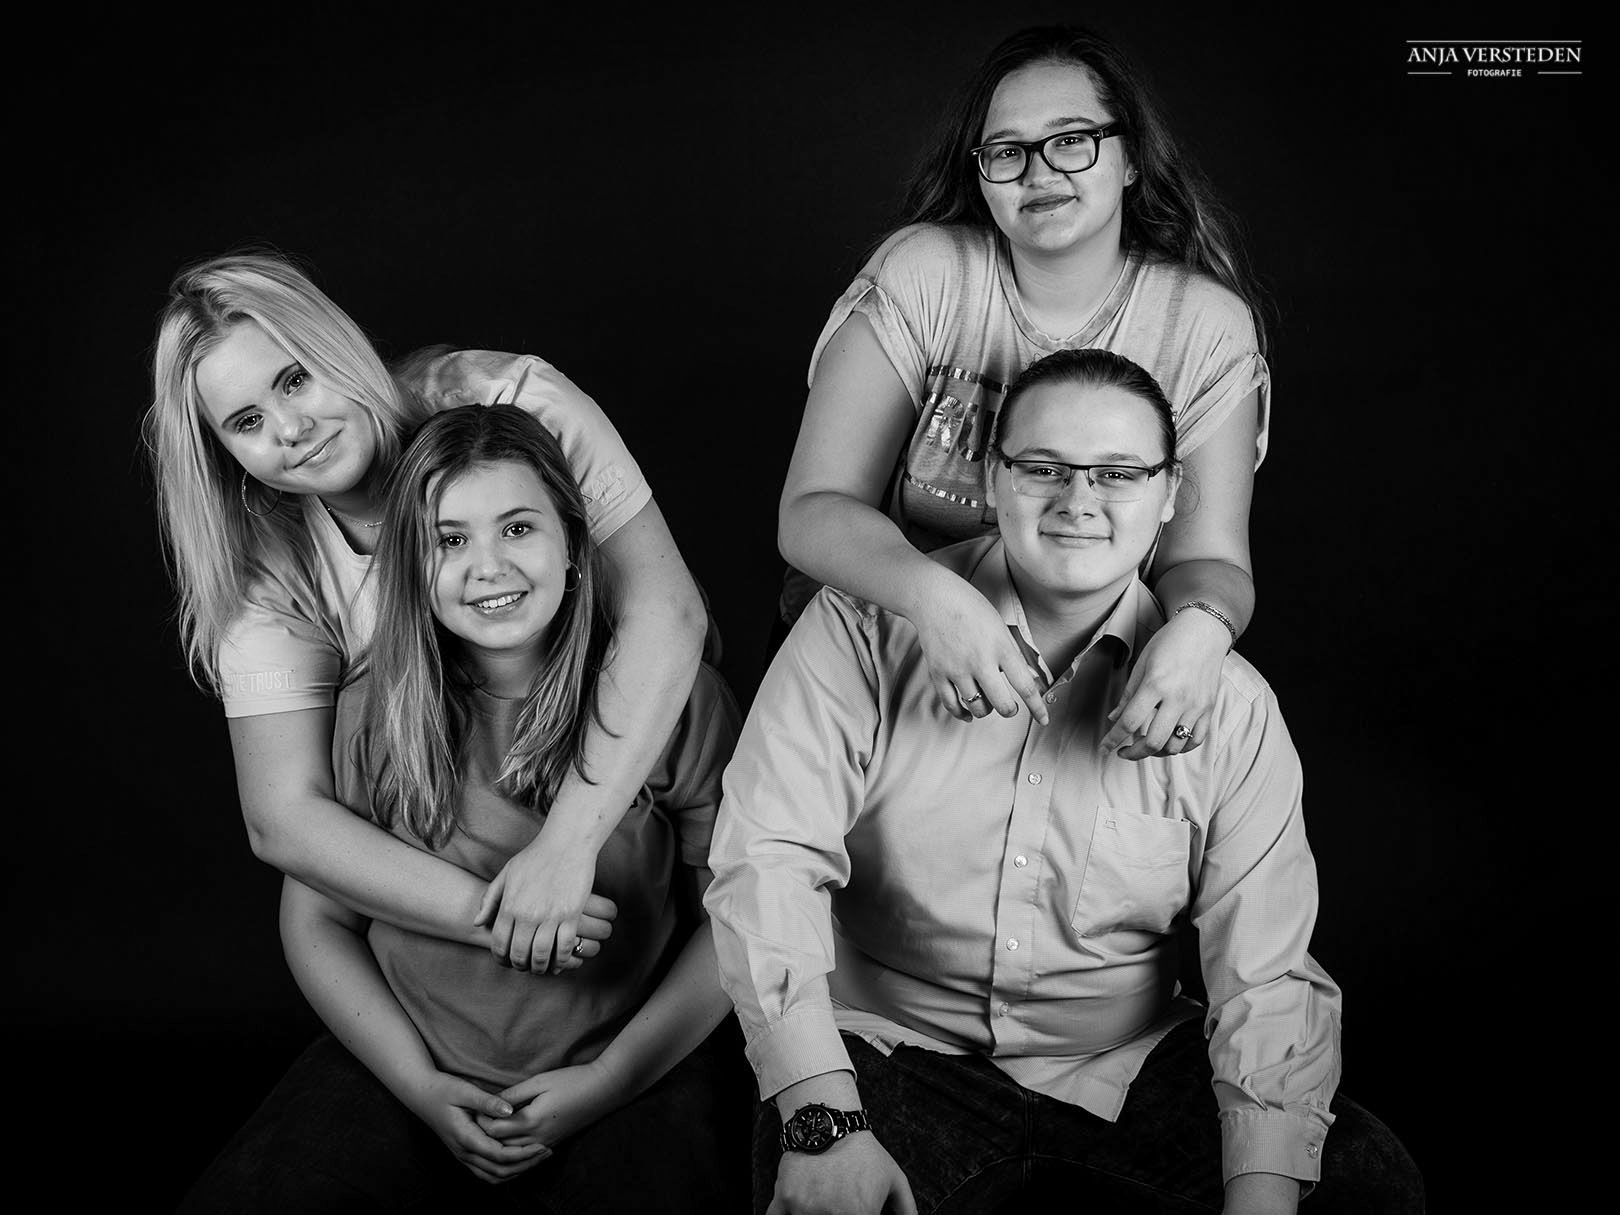 Gezinsfotograaf | Familieportret